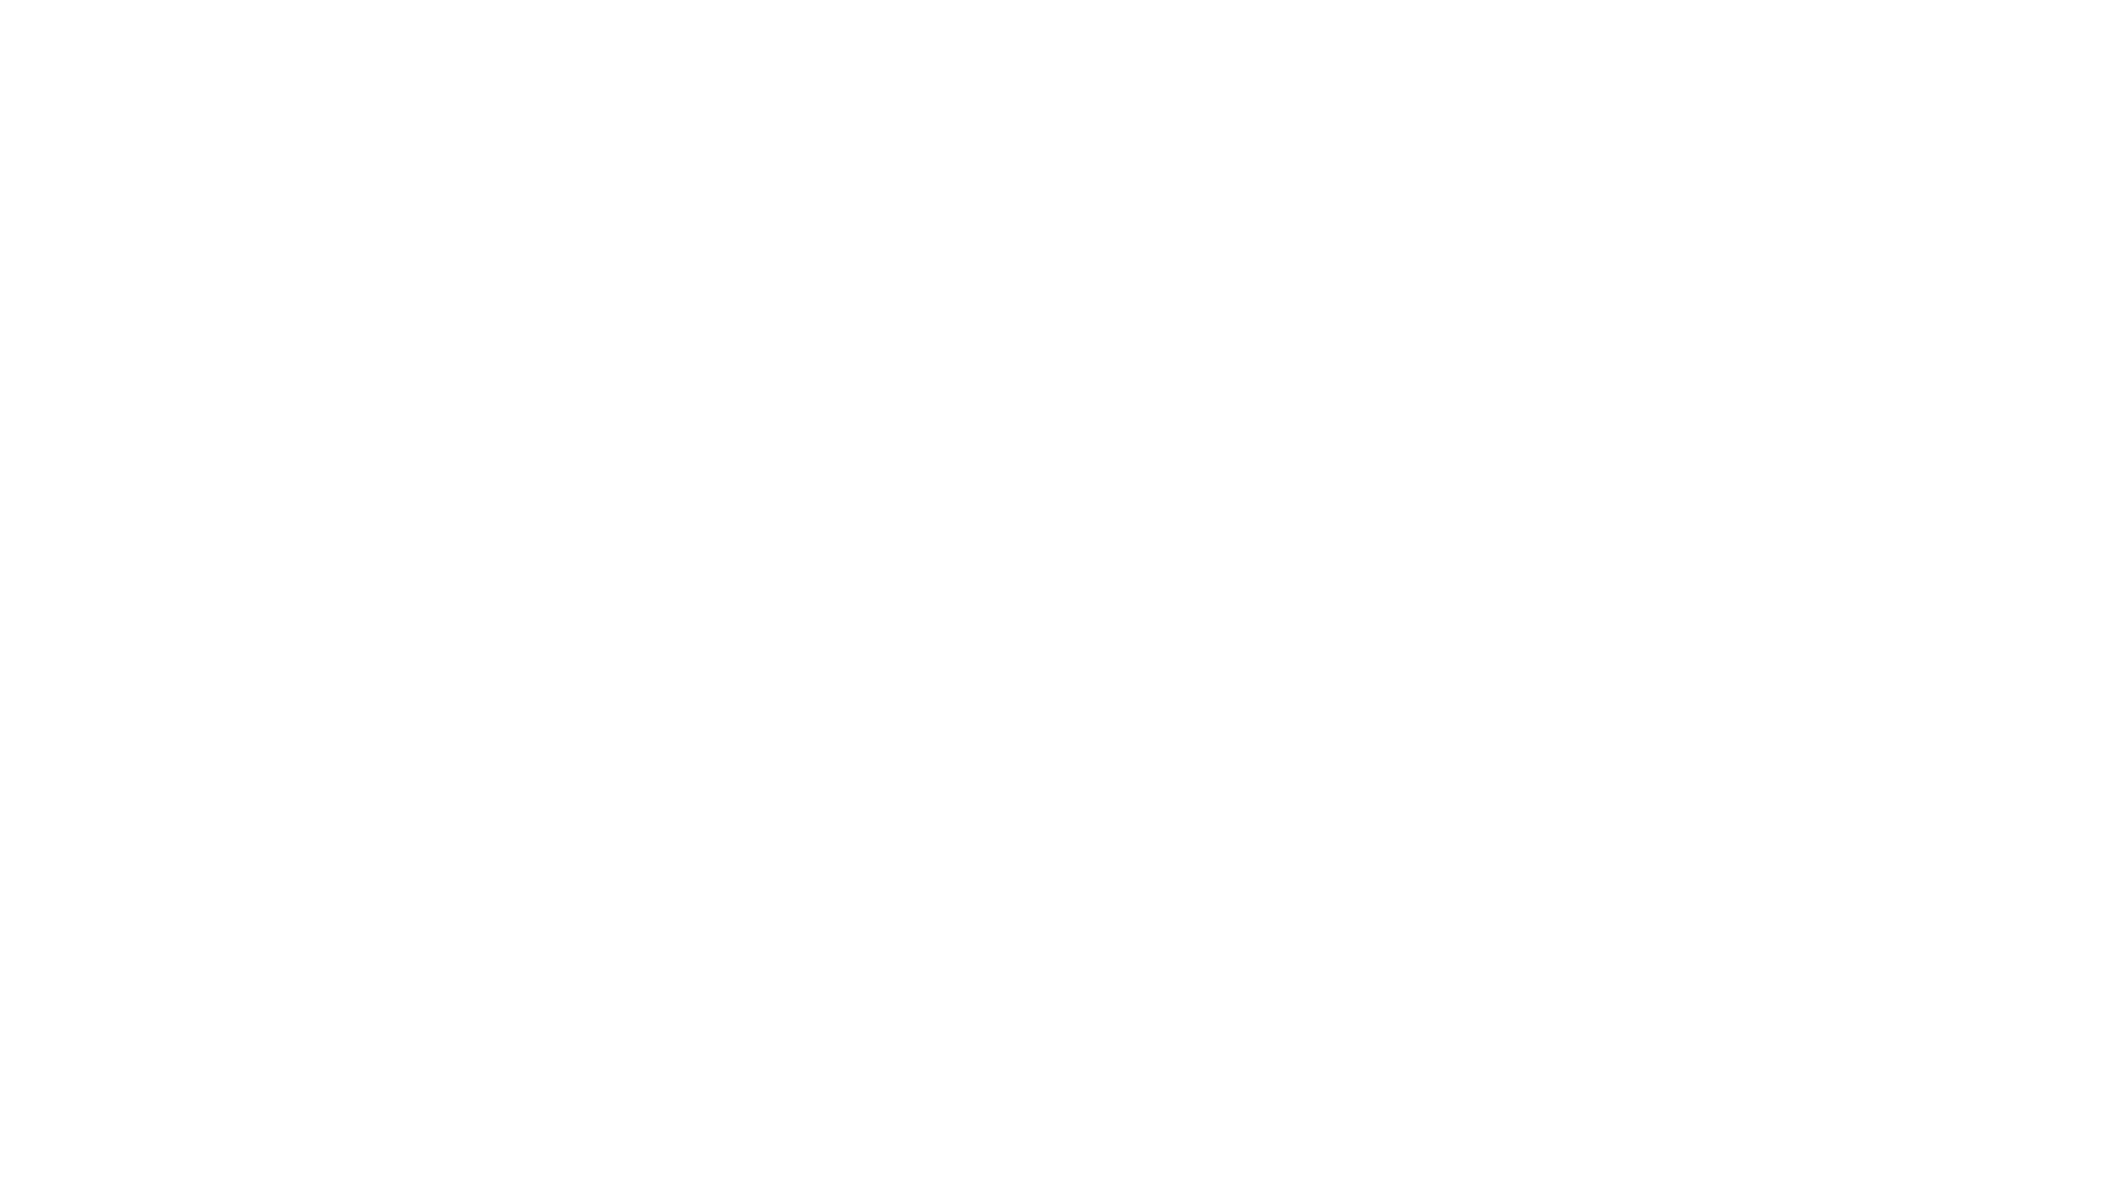 VILLA FONTE POLANICA ZDRÓJ M.2.1